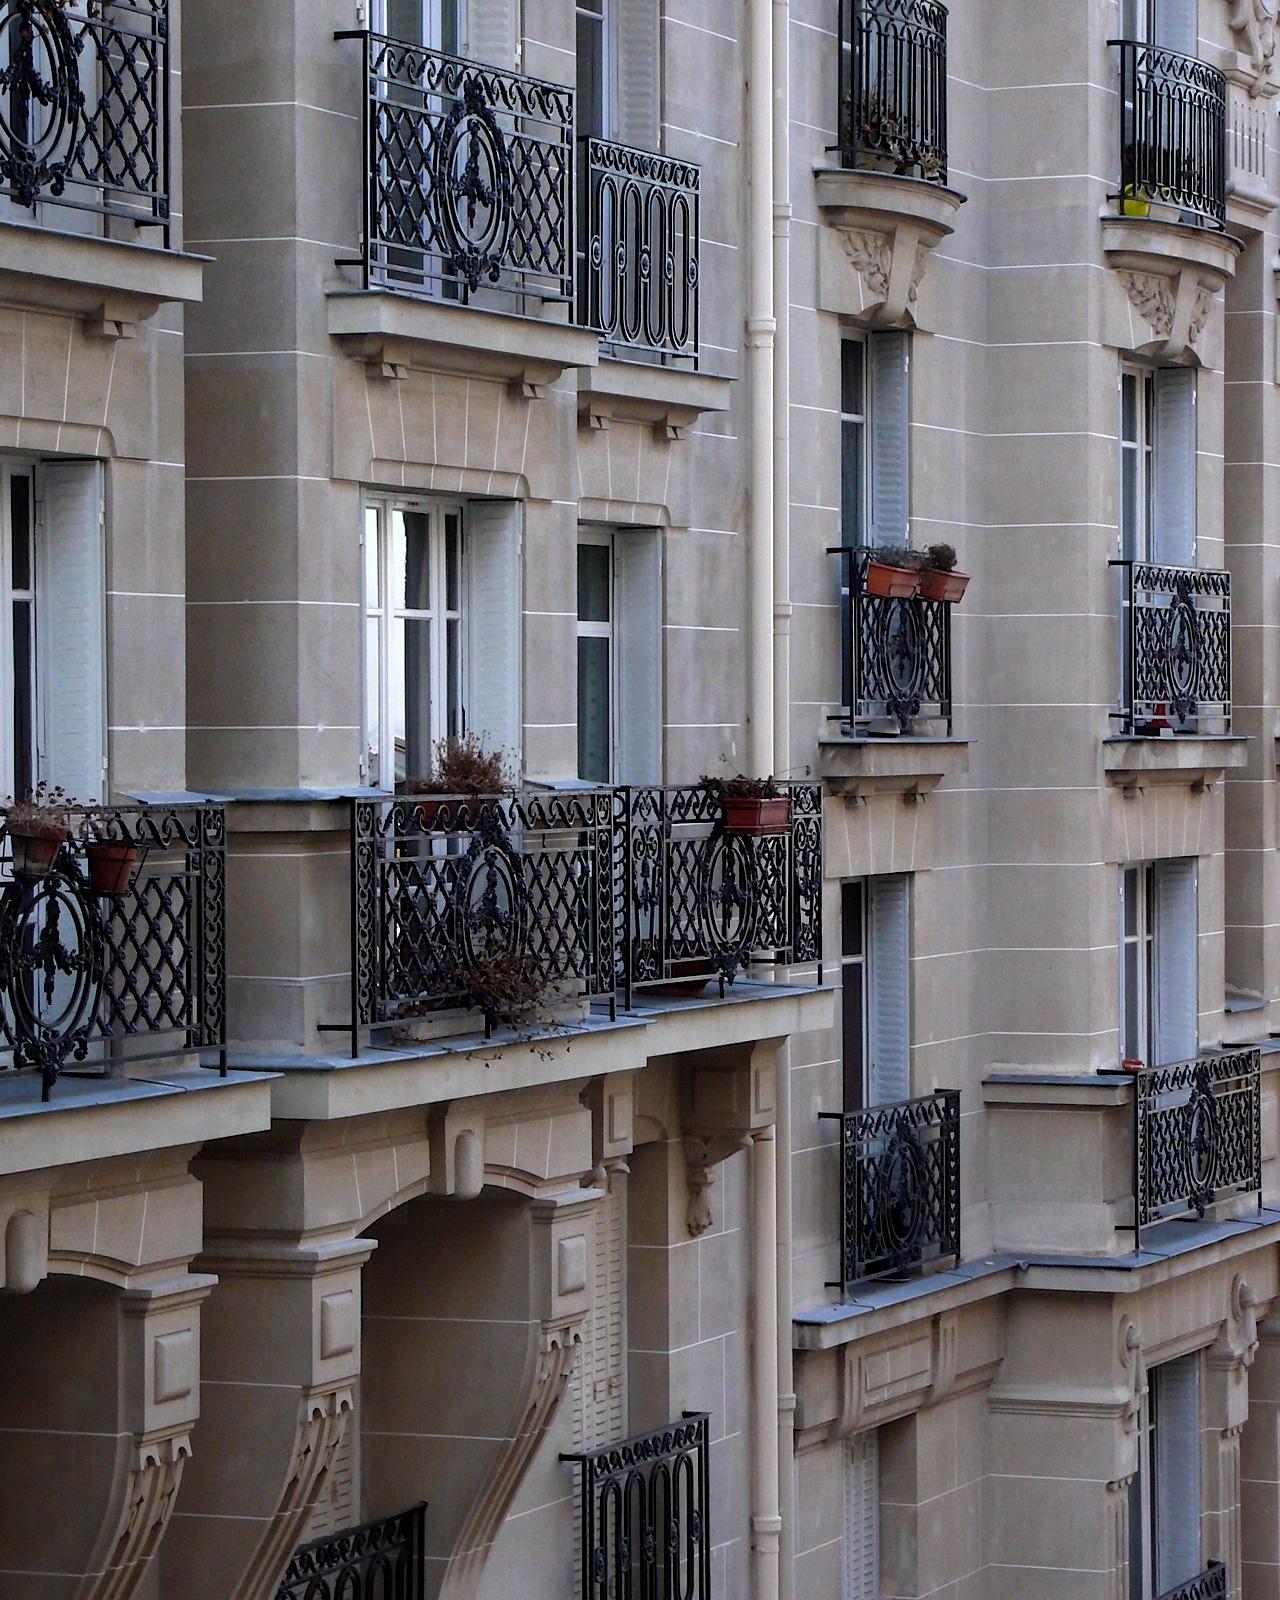 paris-houses-16x20-P1110528.jpg